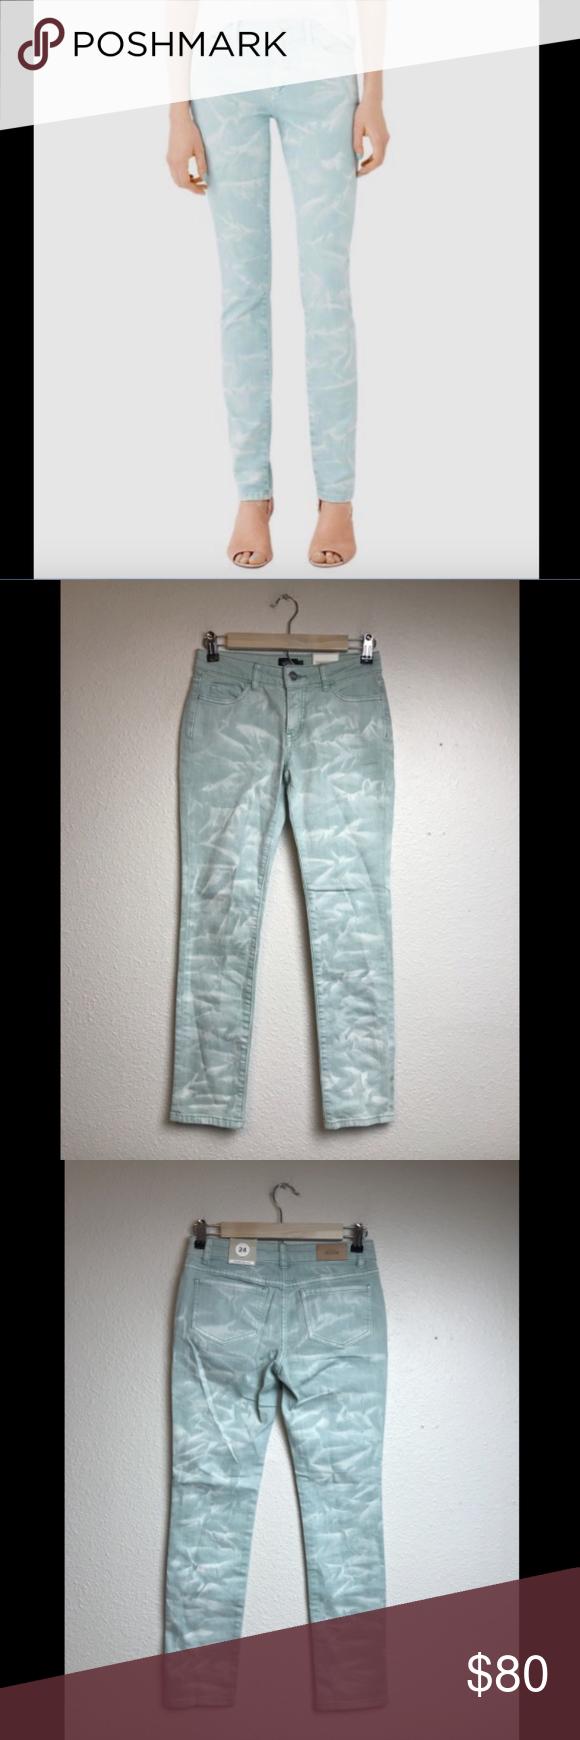 e66401a68c Kate Spade Saturday Skinny Jeans Blue Steel Marble Kate Spade Saturday  Women s Skinny Ankle Jeans Blue Steel Skinny Color-Blue Pattern-Marbled